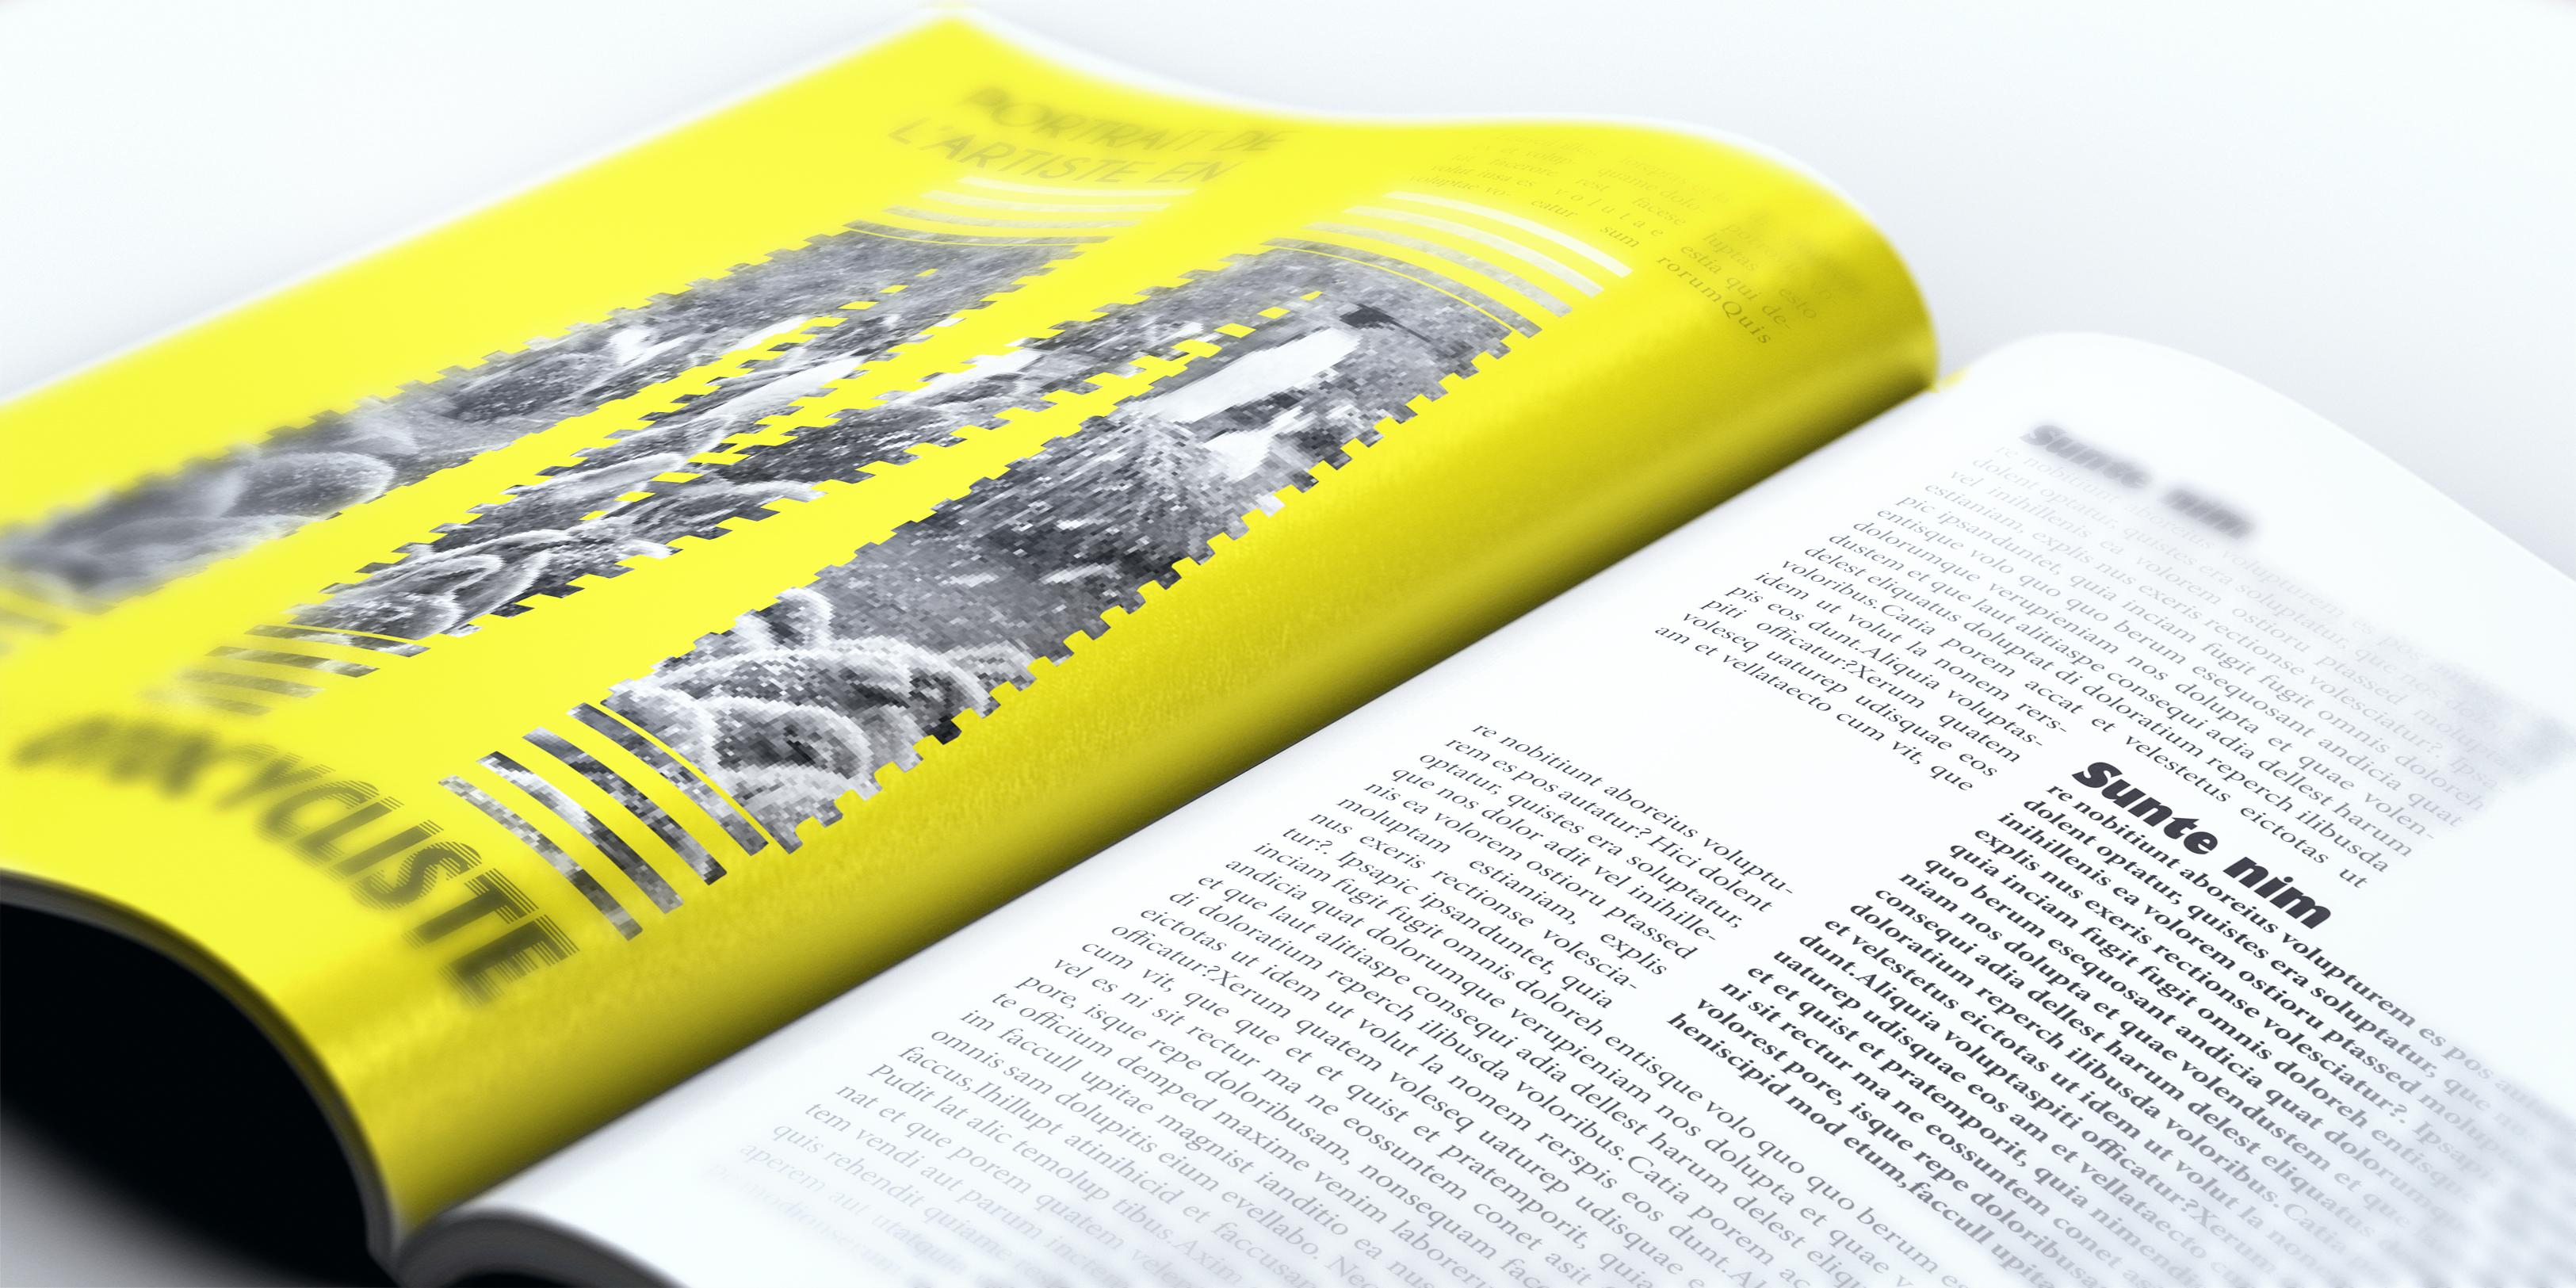 Magazine Close Up 01